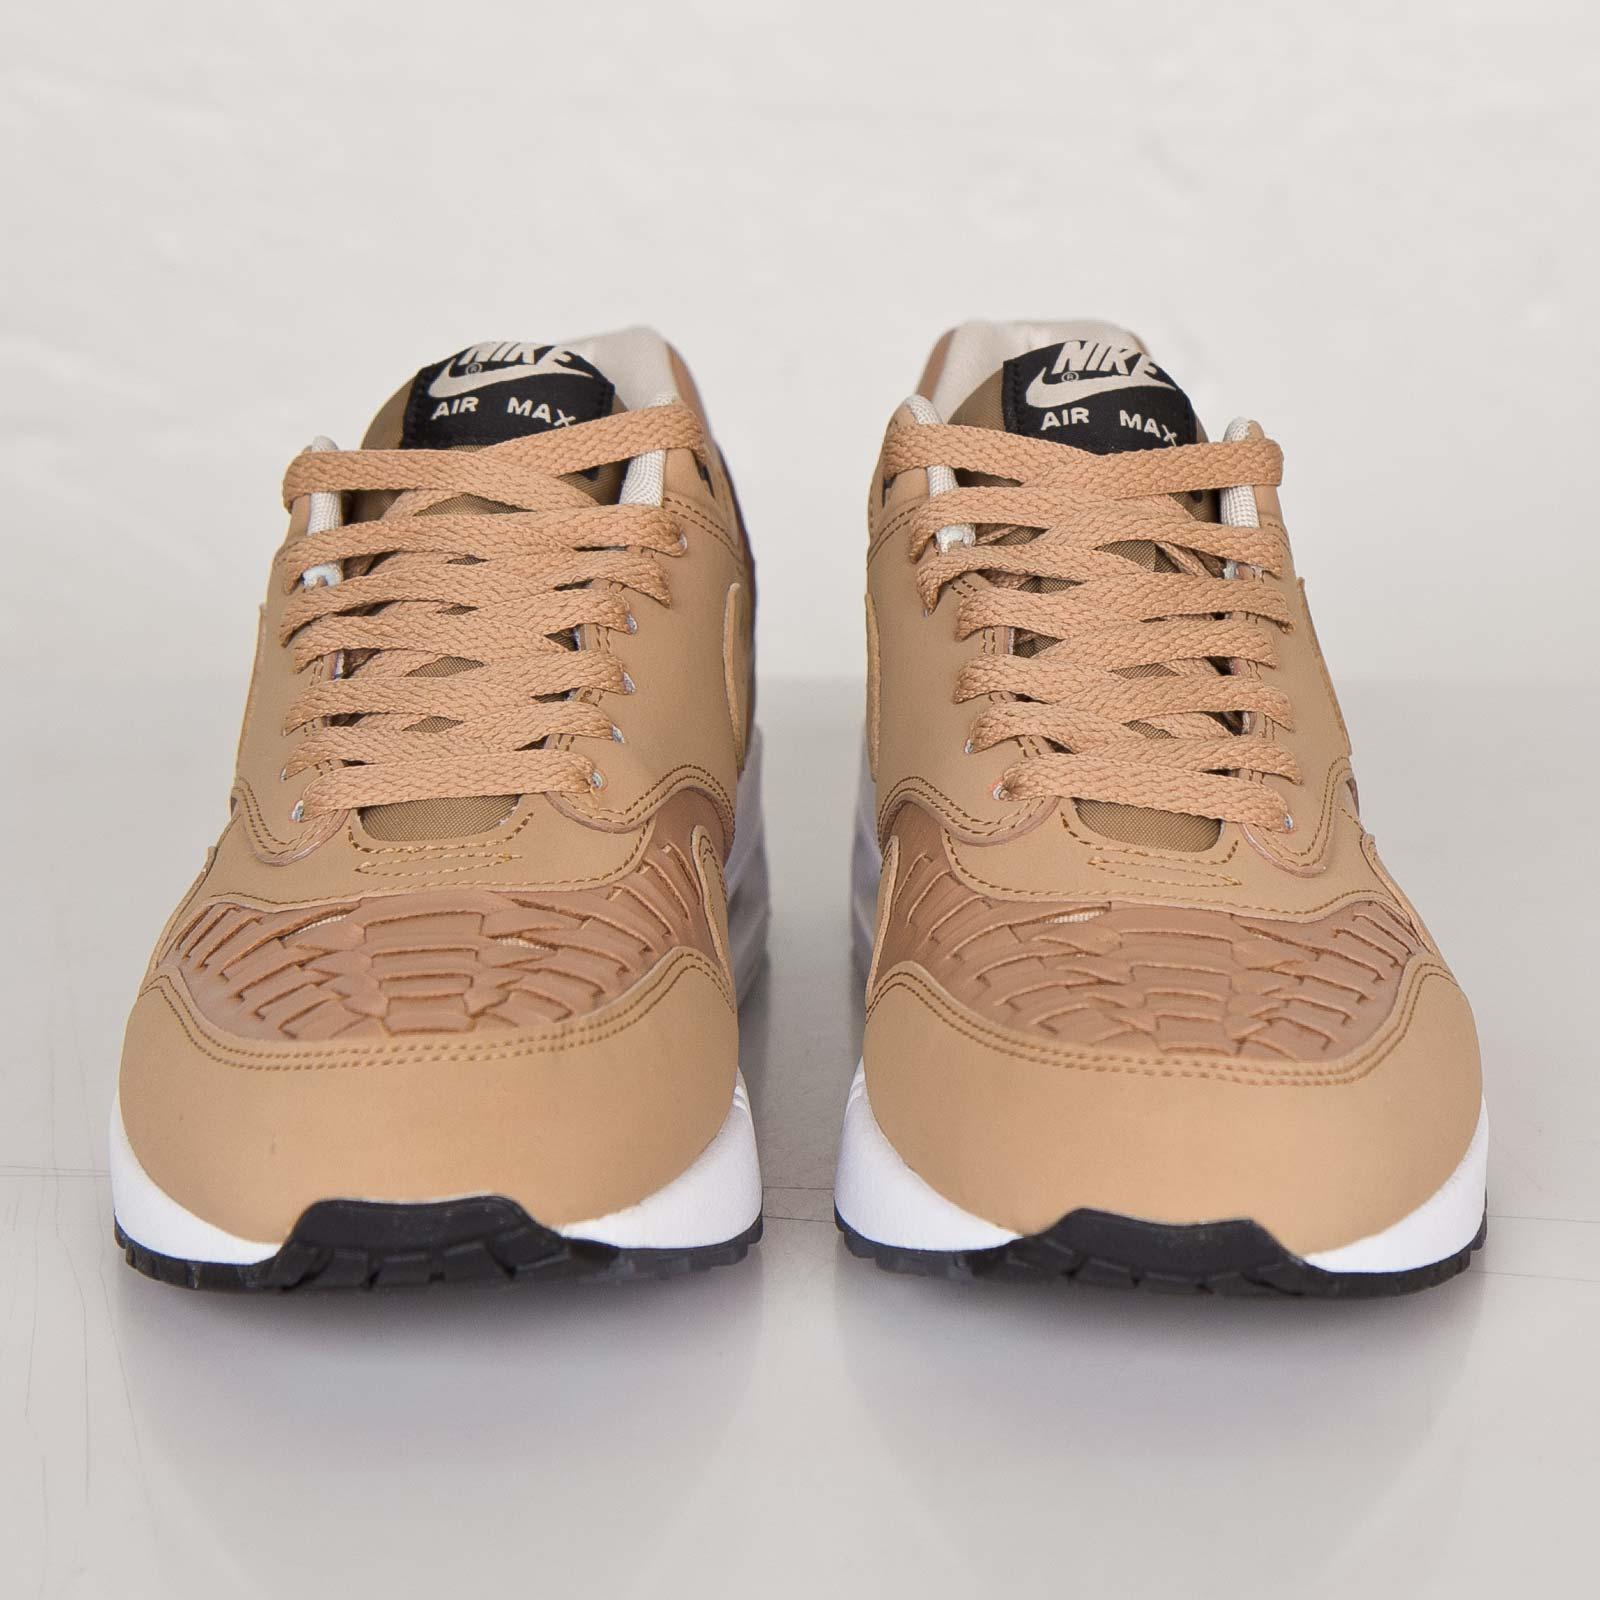 Nike Air Max 1 Woven 725232 200 Sneakersnstuff